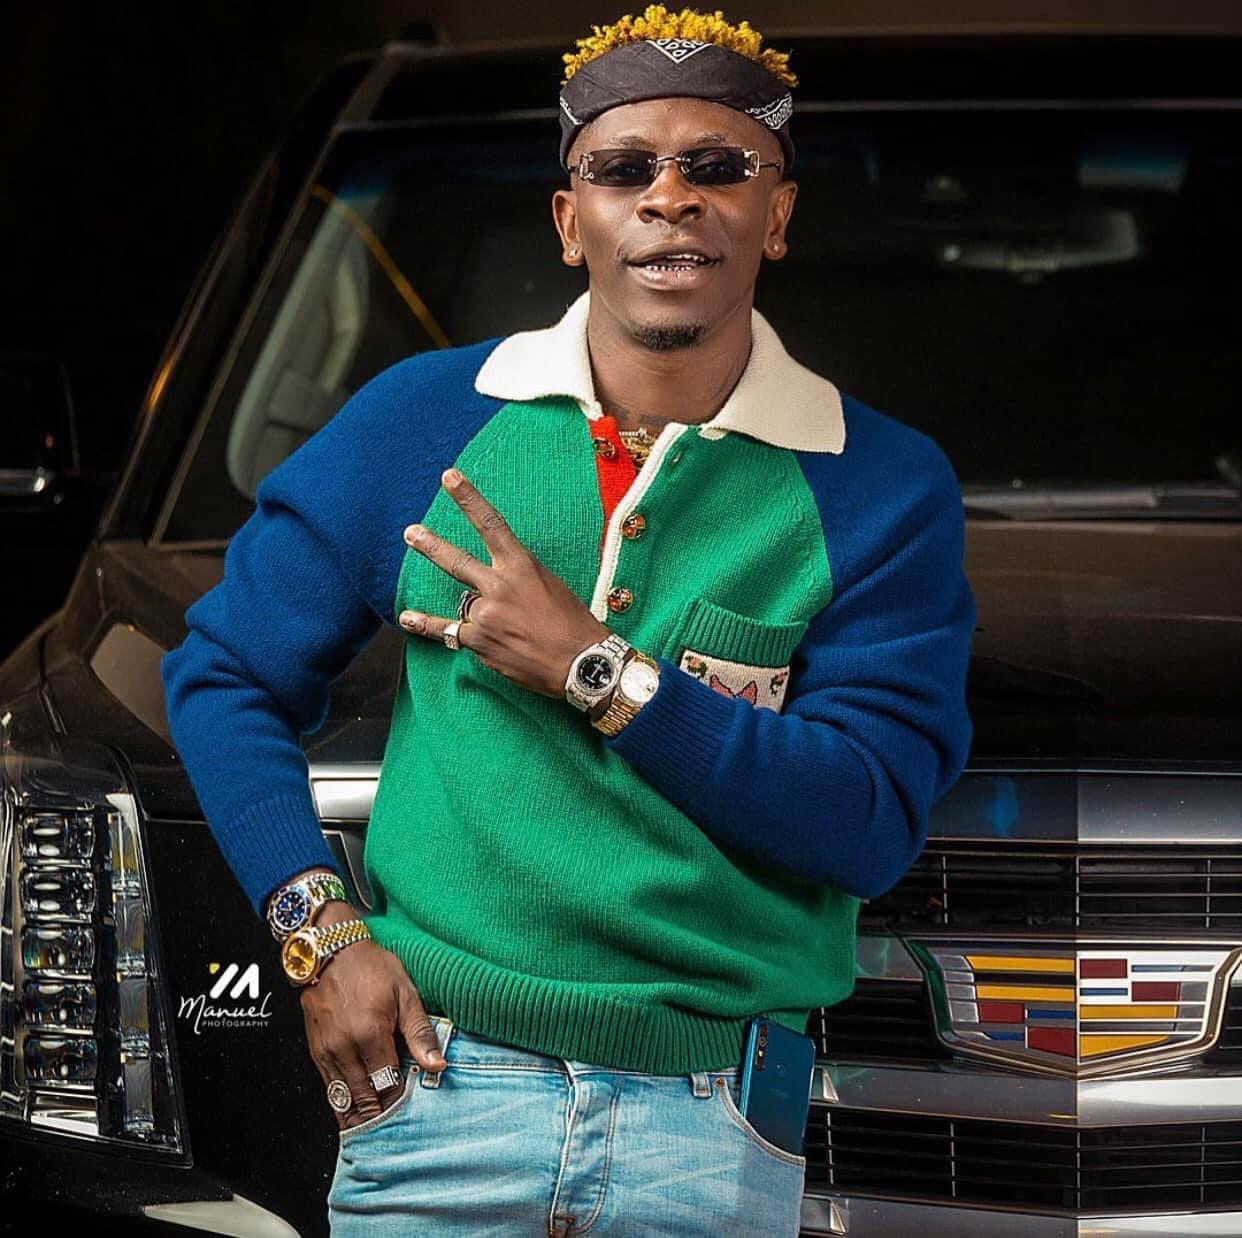 DOWNLOAD Shatta Wale - Dealer MP3 ✓ - GhanaSongs.com - Ghana's Online Music  Downloads